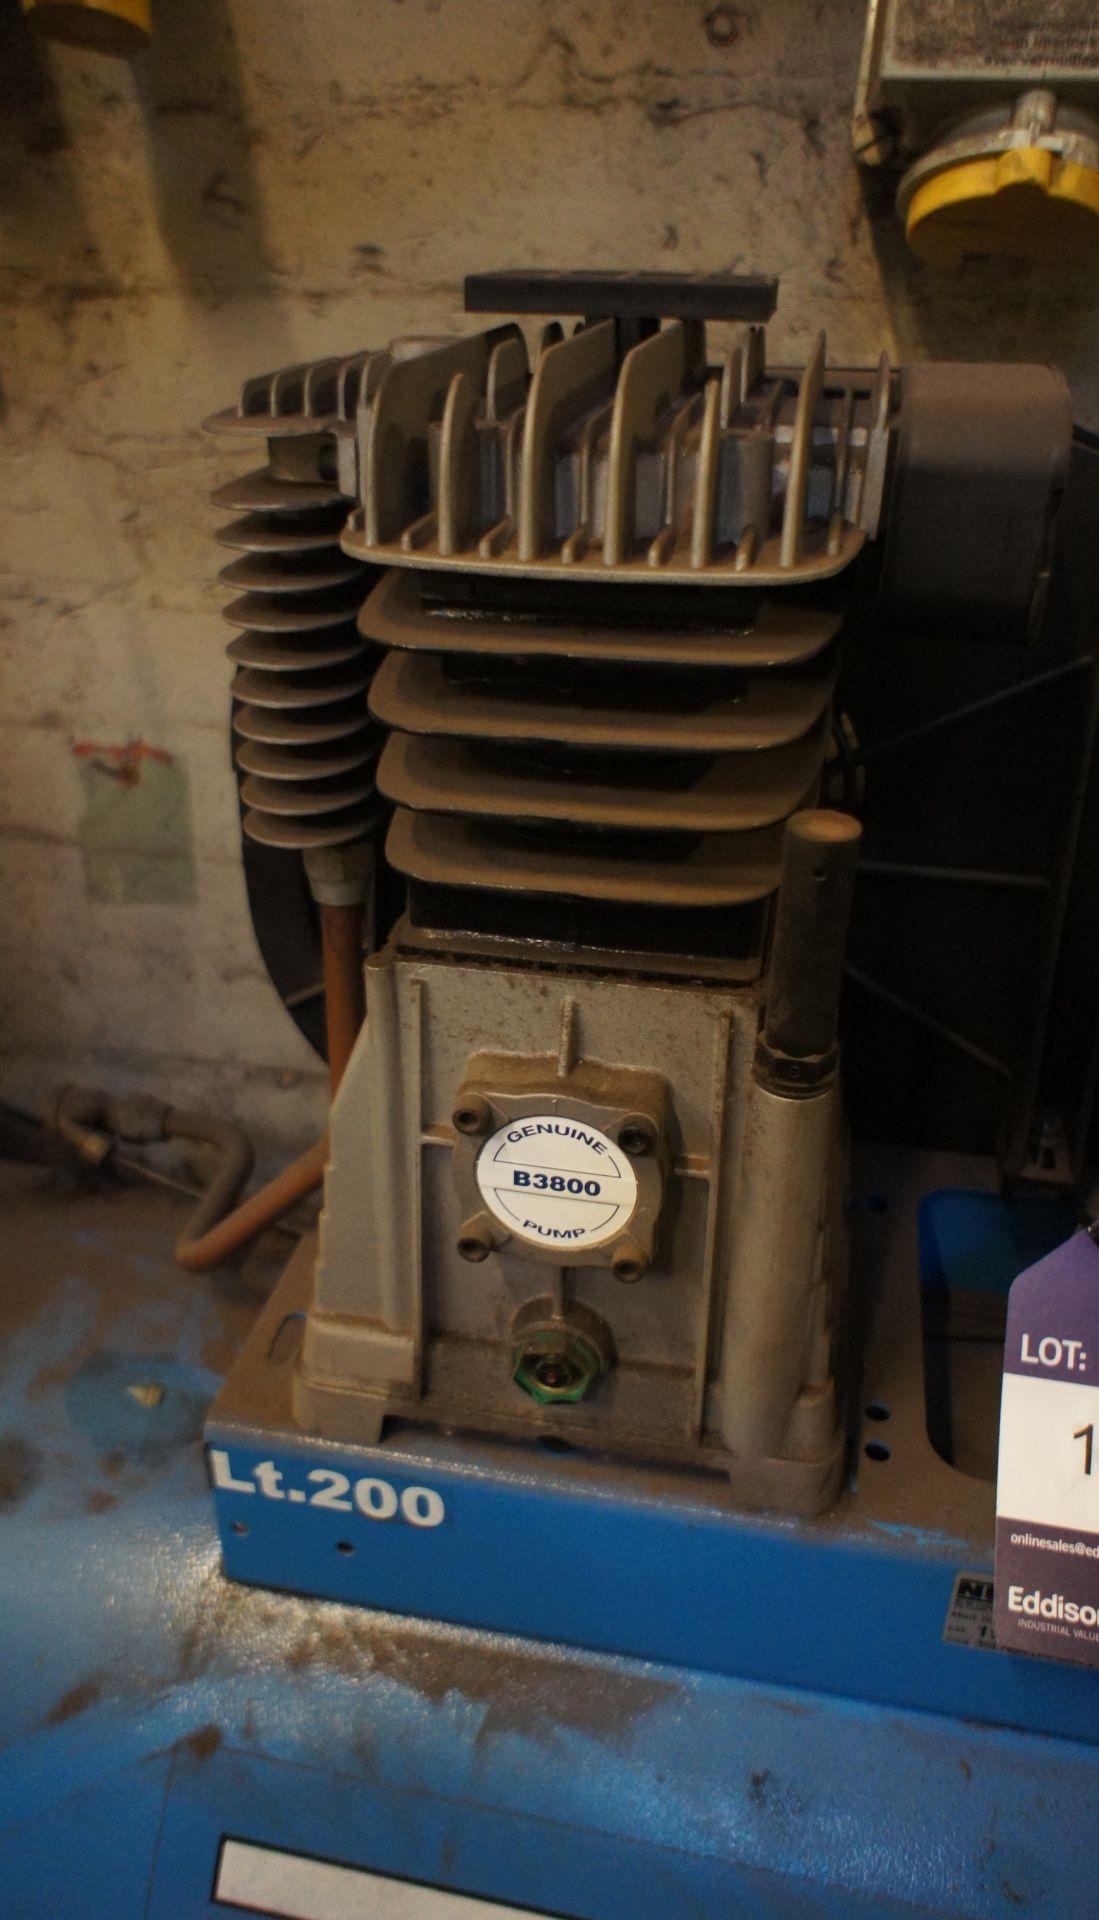 Nuair HP3 Receiver mounted Workshop Compressor, 20 - Image 4 of 4